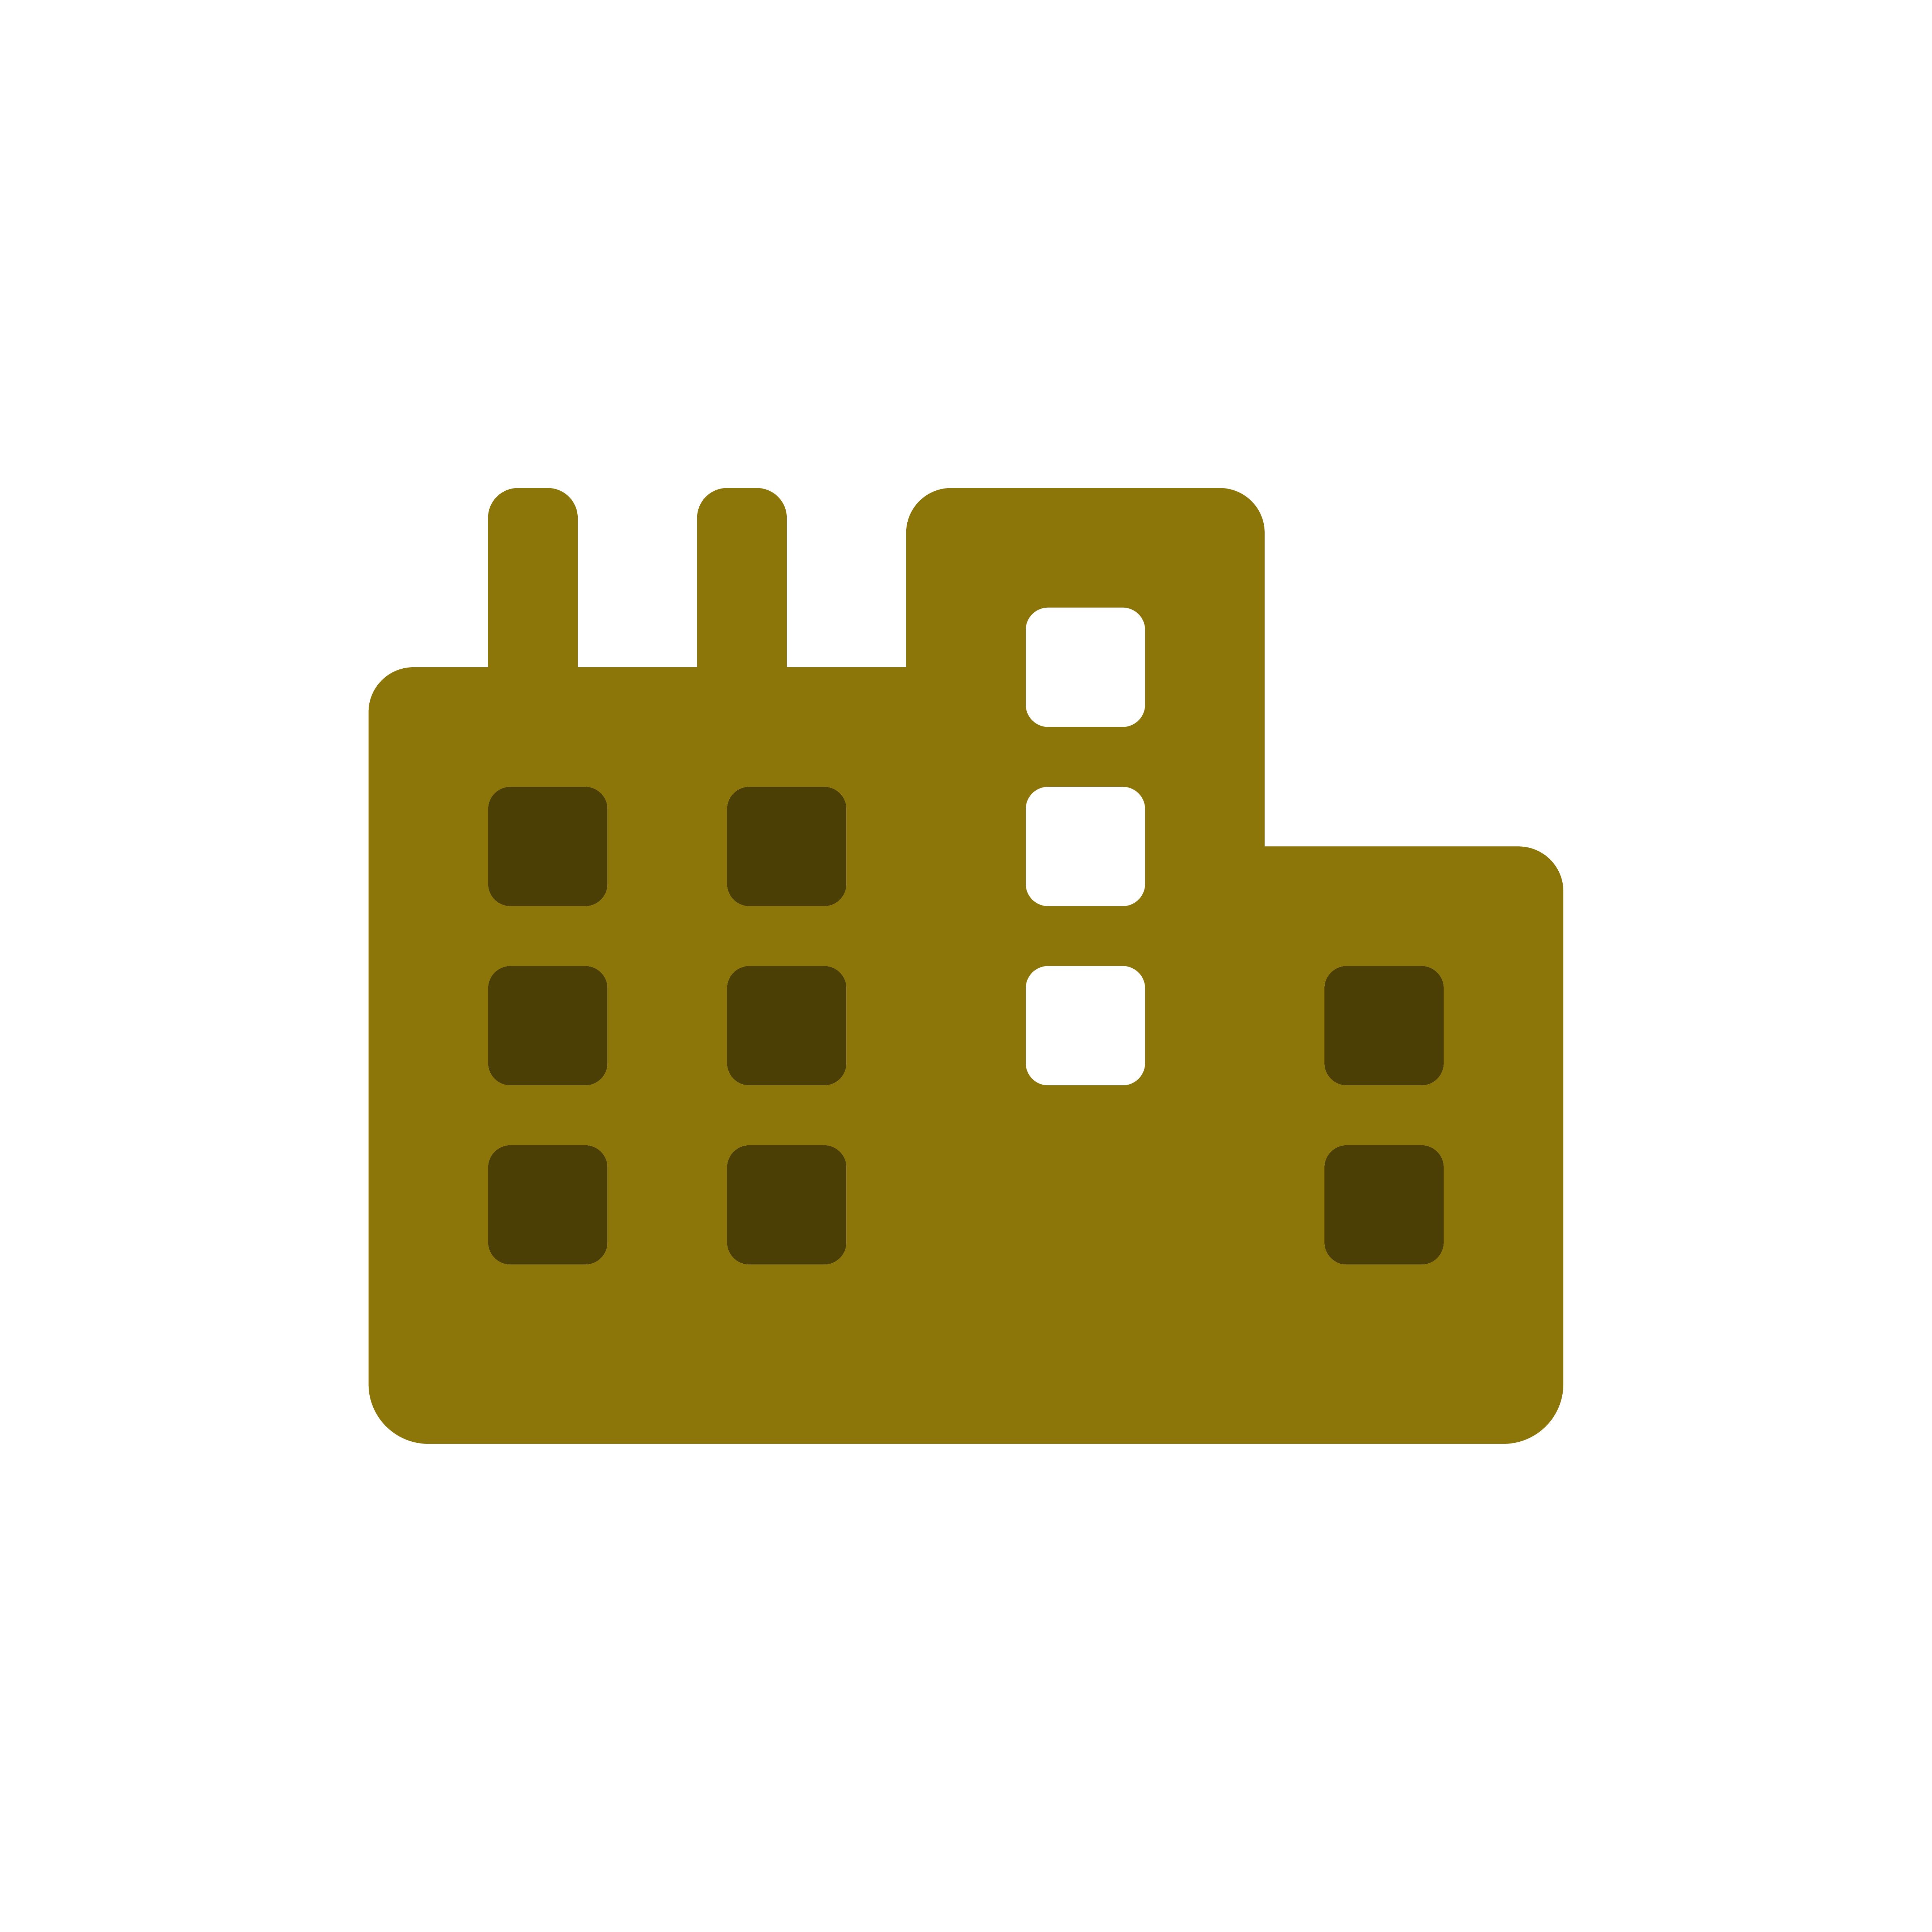 Richiesta attribuzione/variazione numeri civici